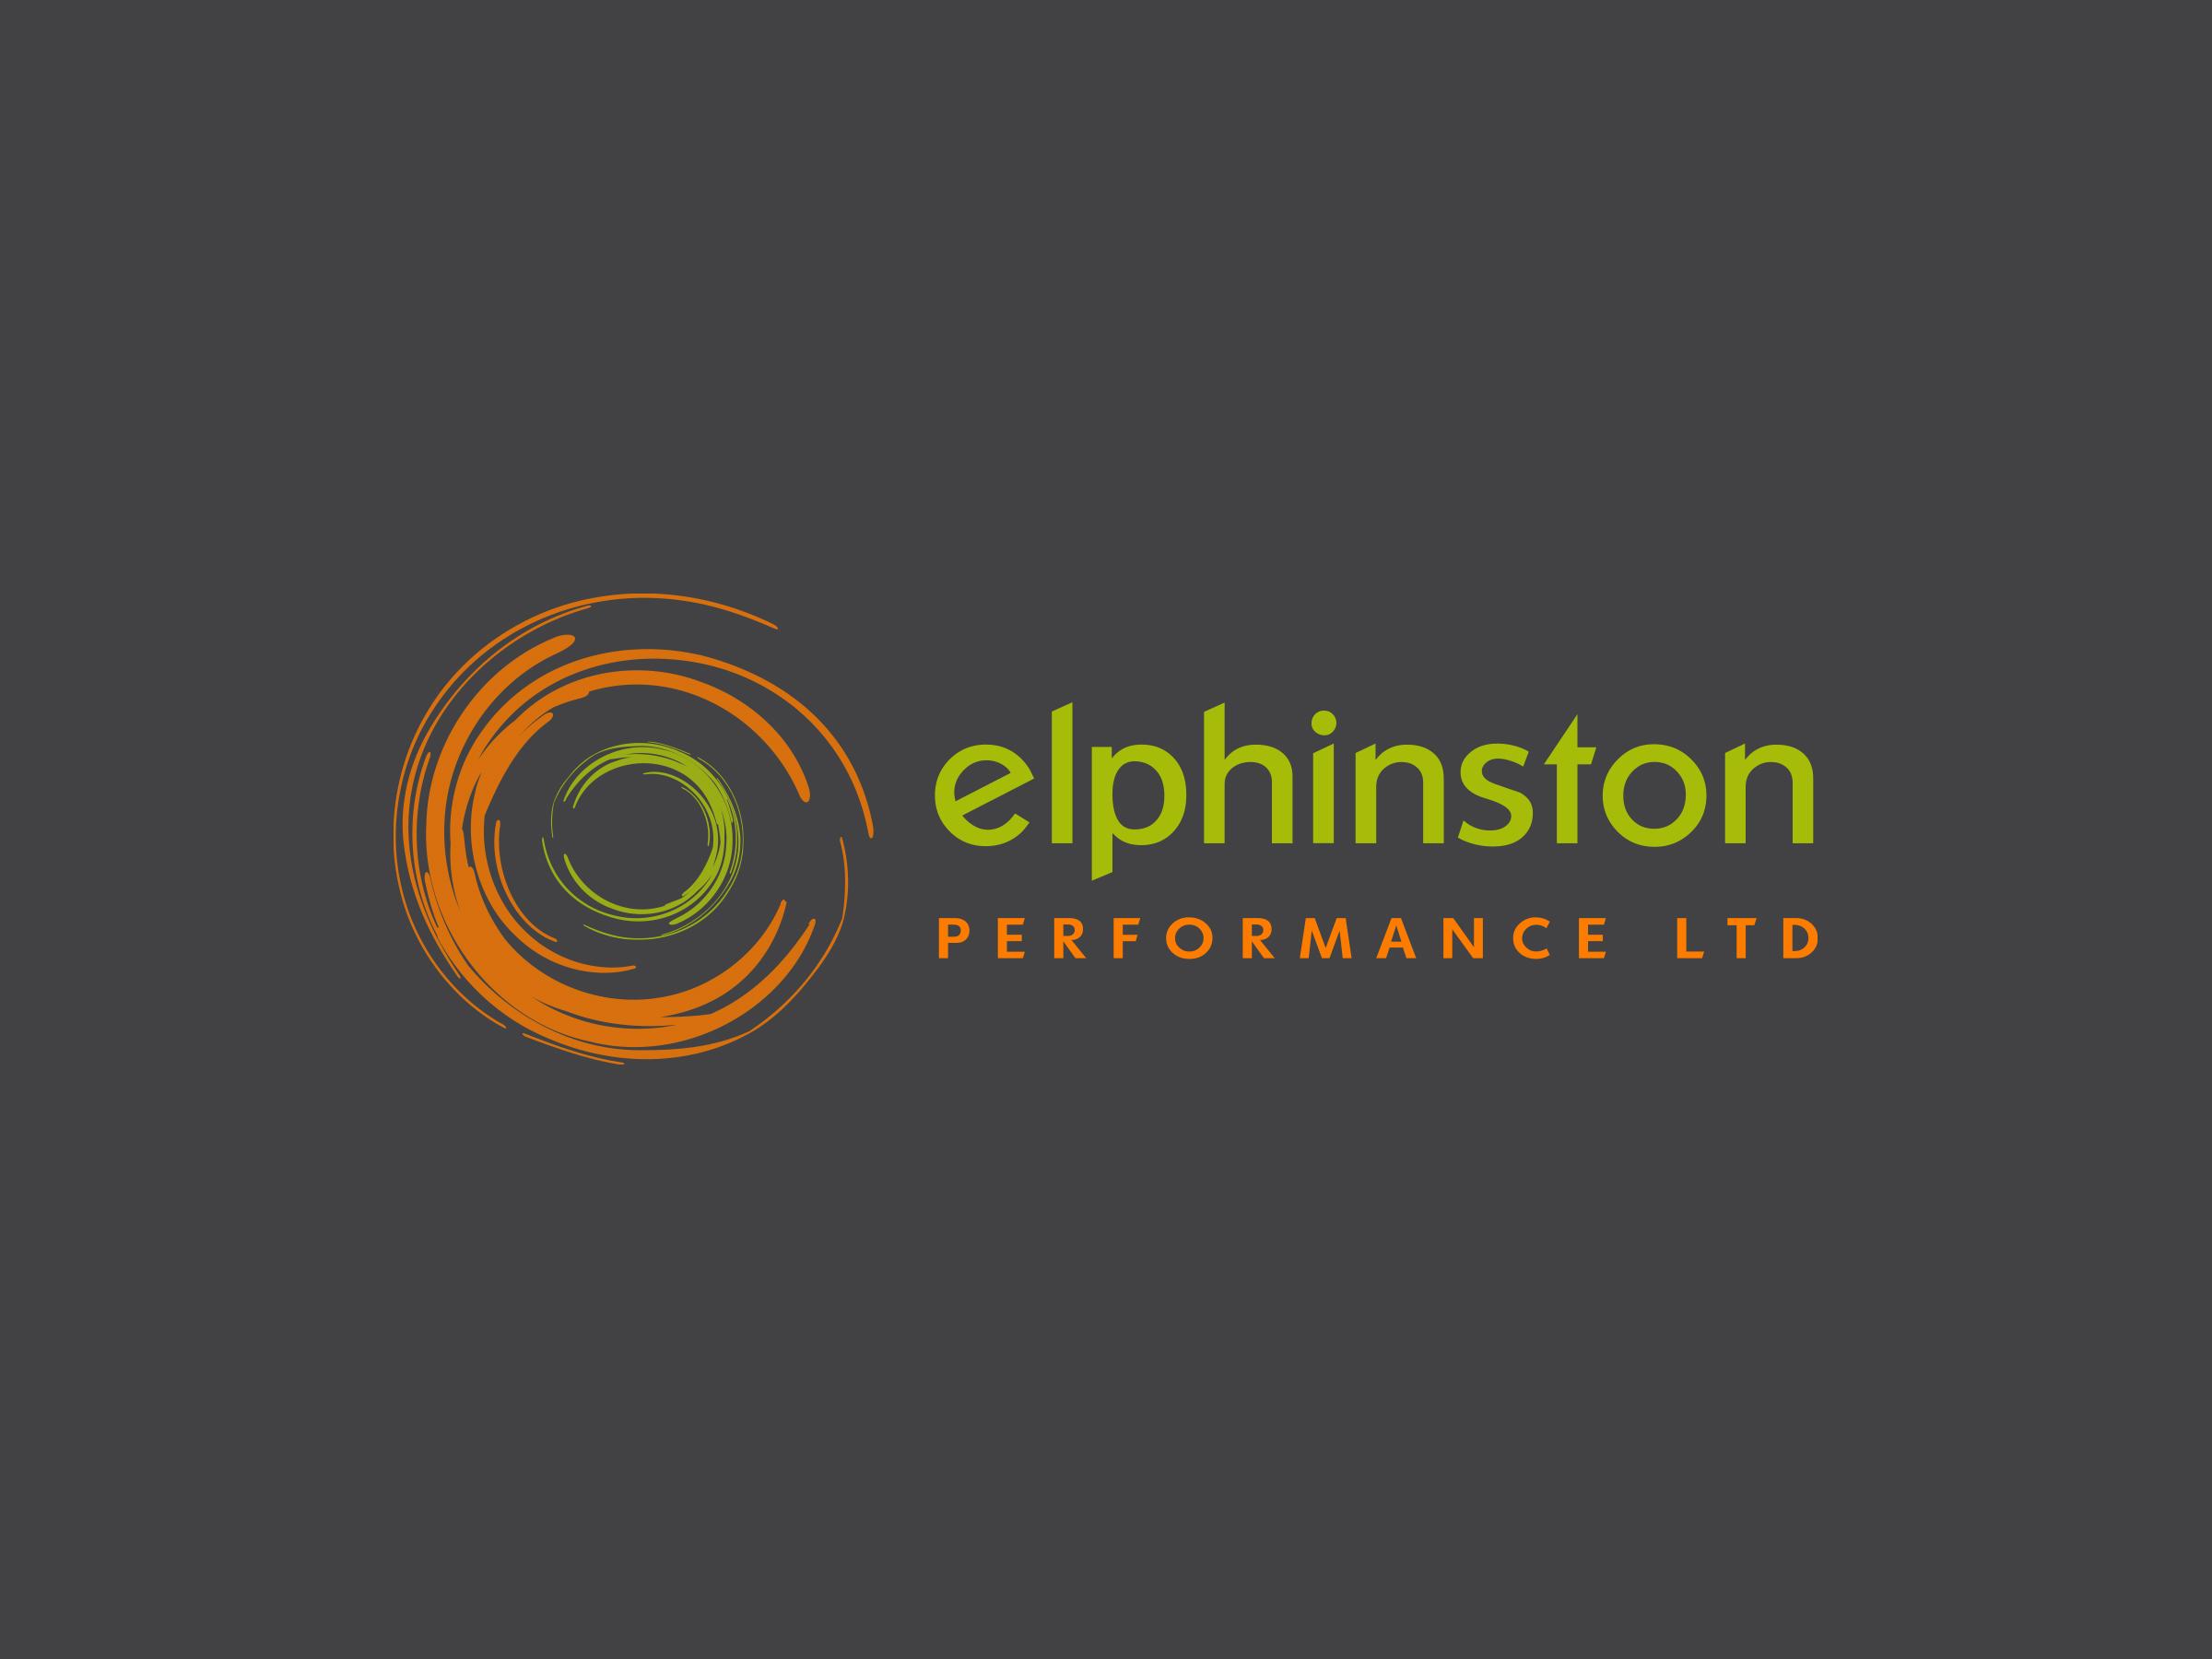 Elphinston-Performance-Logo-grey.JPG